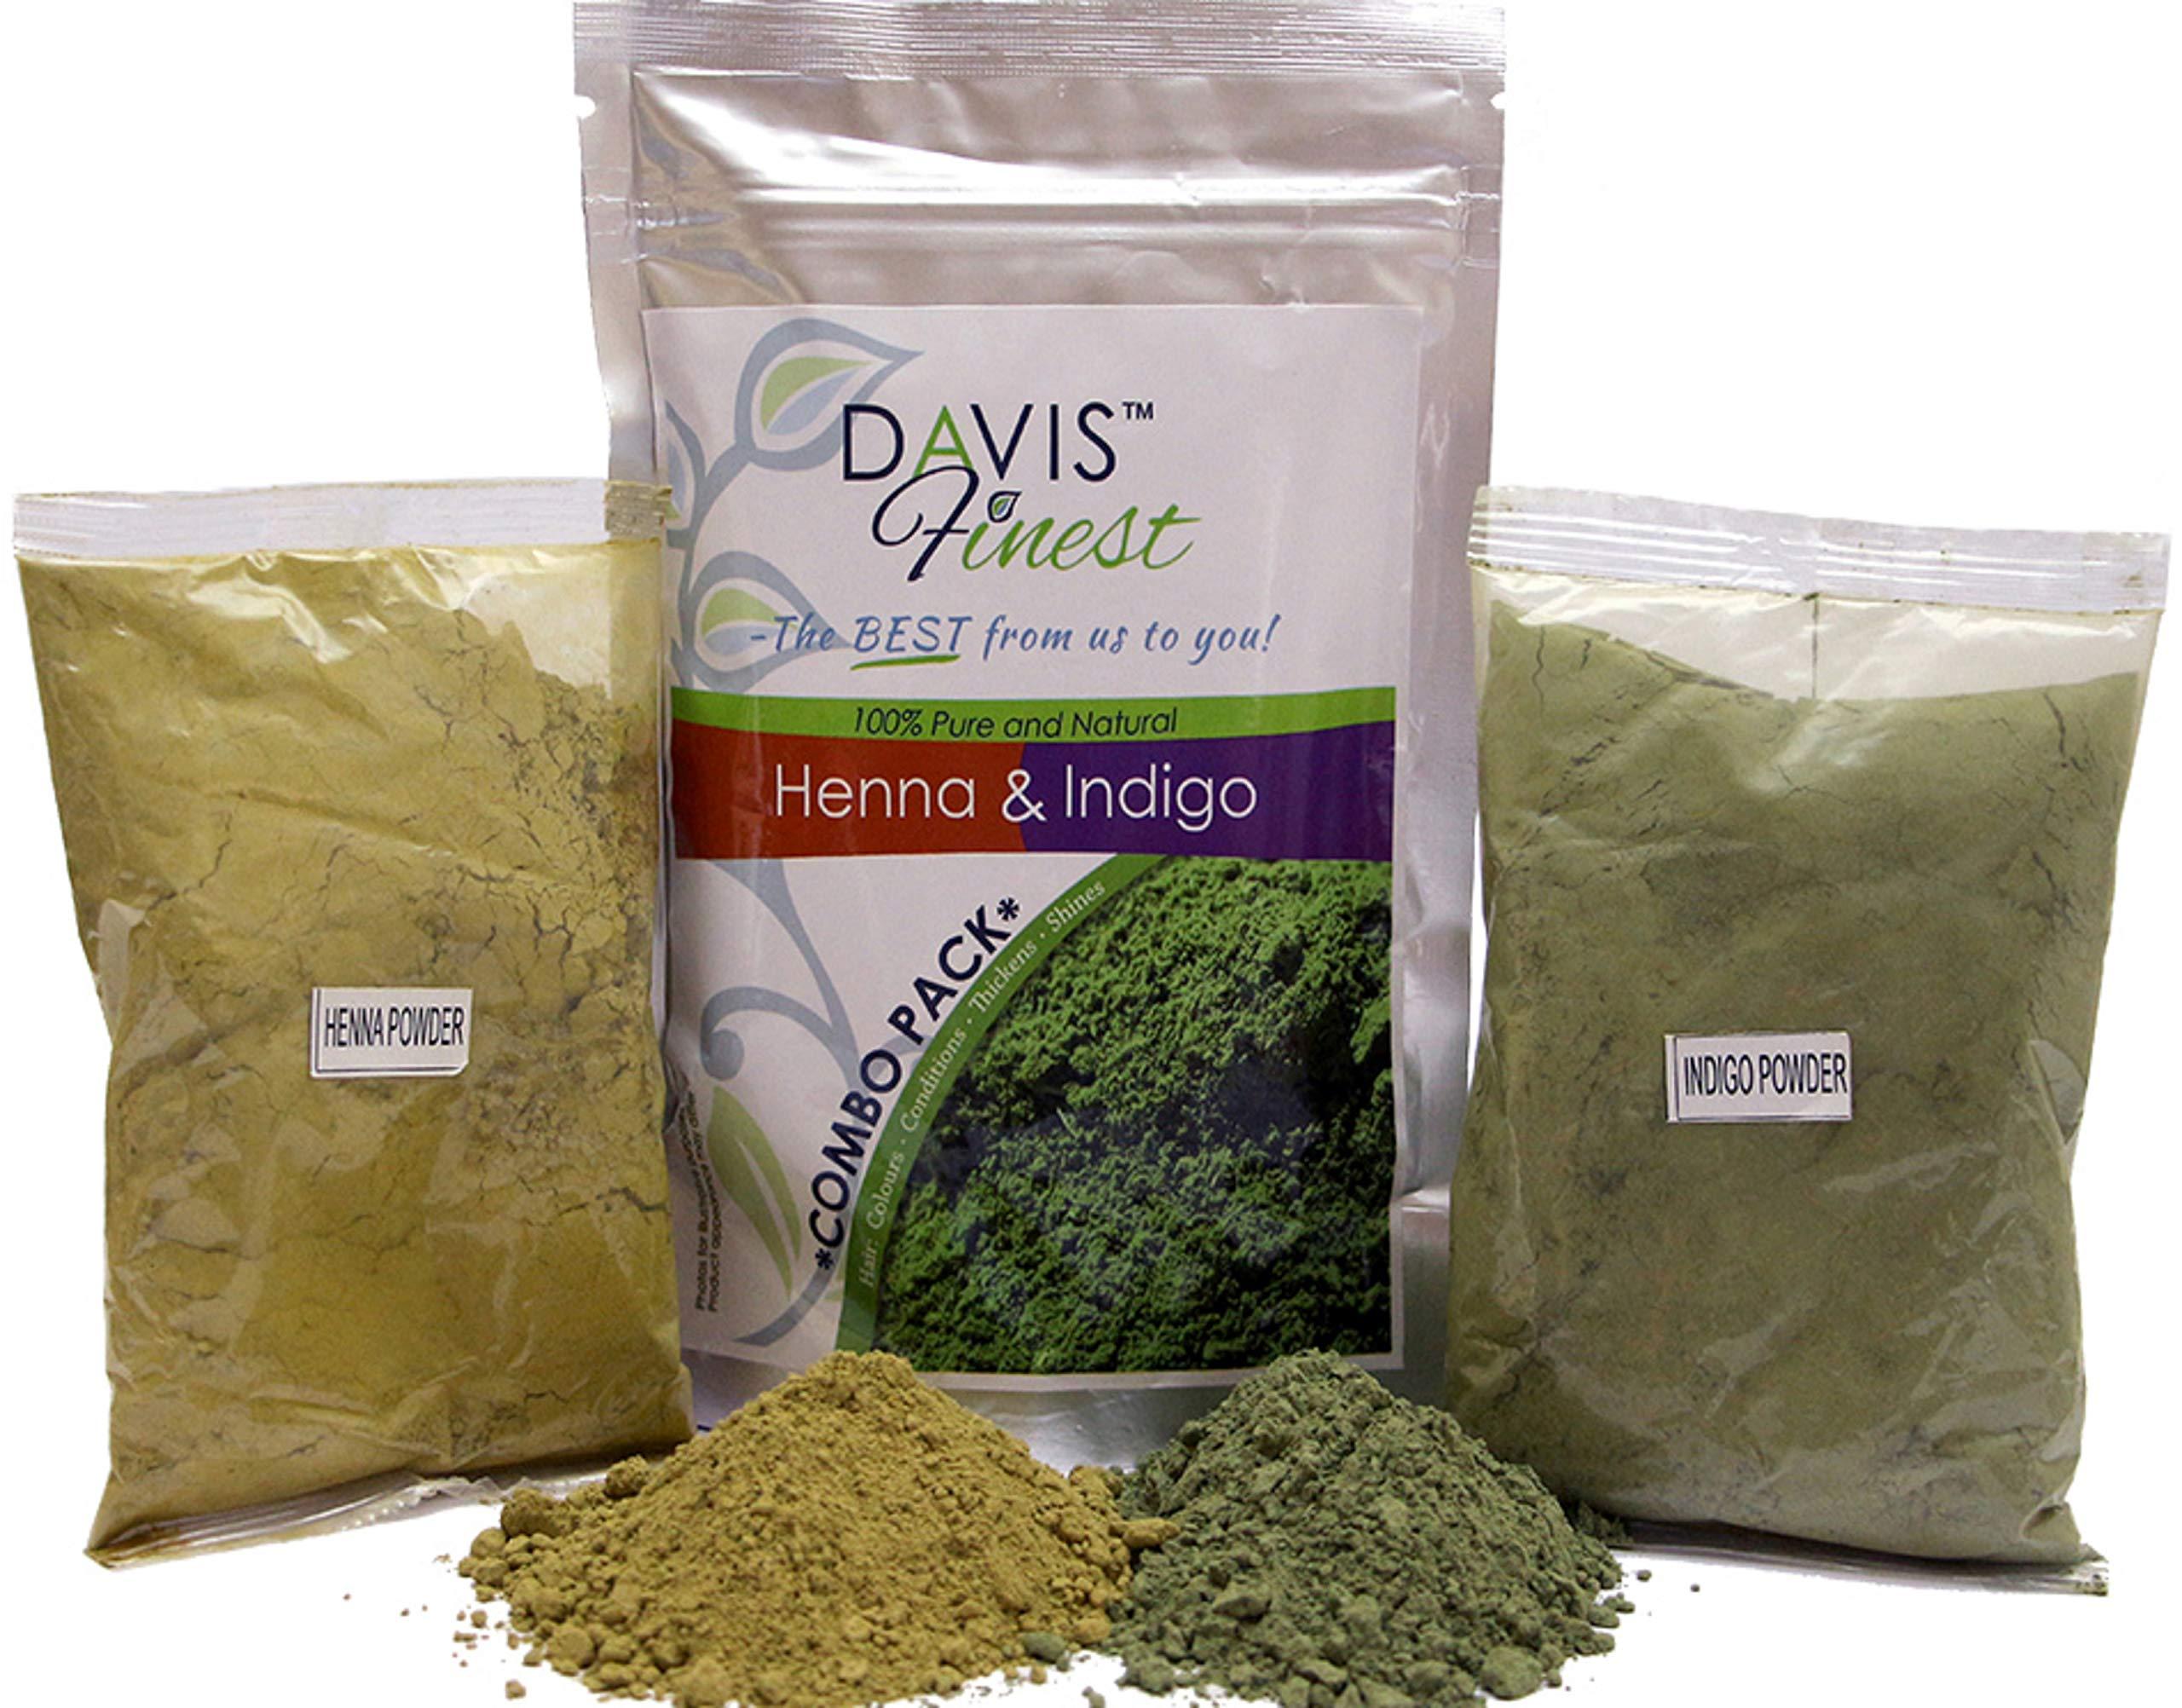 Henna Indigo Powder For Hair Color Black Brown & Beard Dye for Men - 100g Henna & 100g Indigo (200gm) by Davis Finest